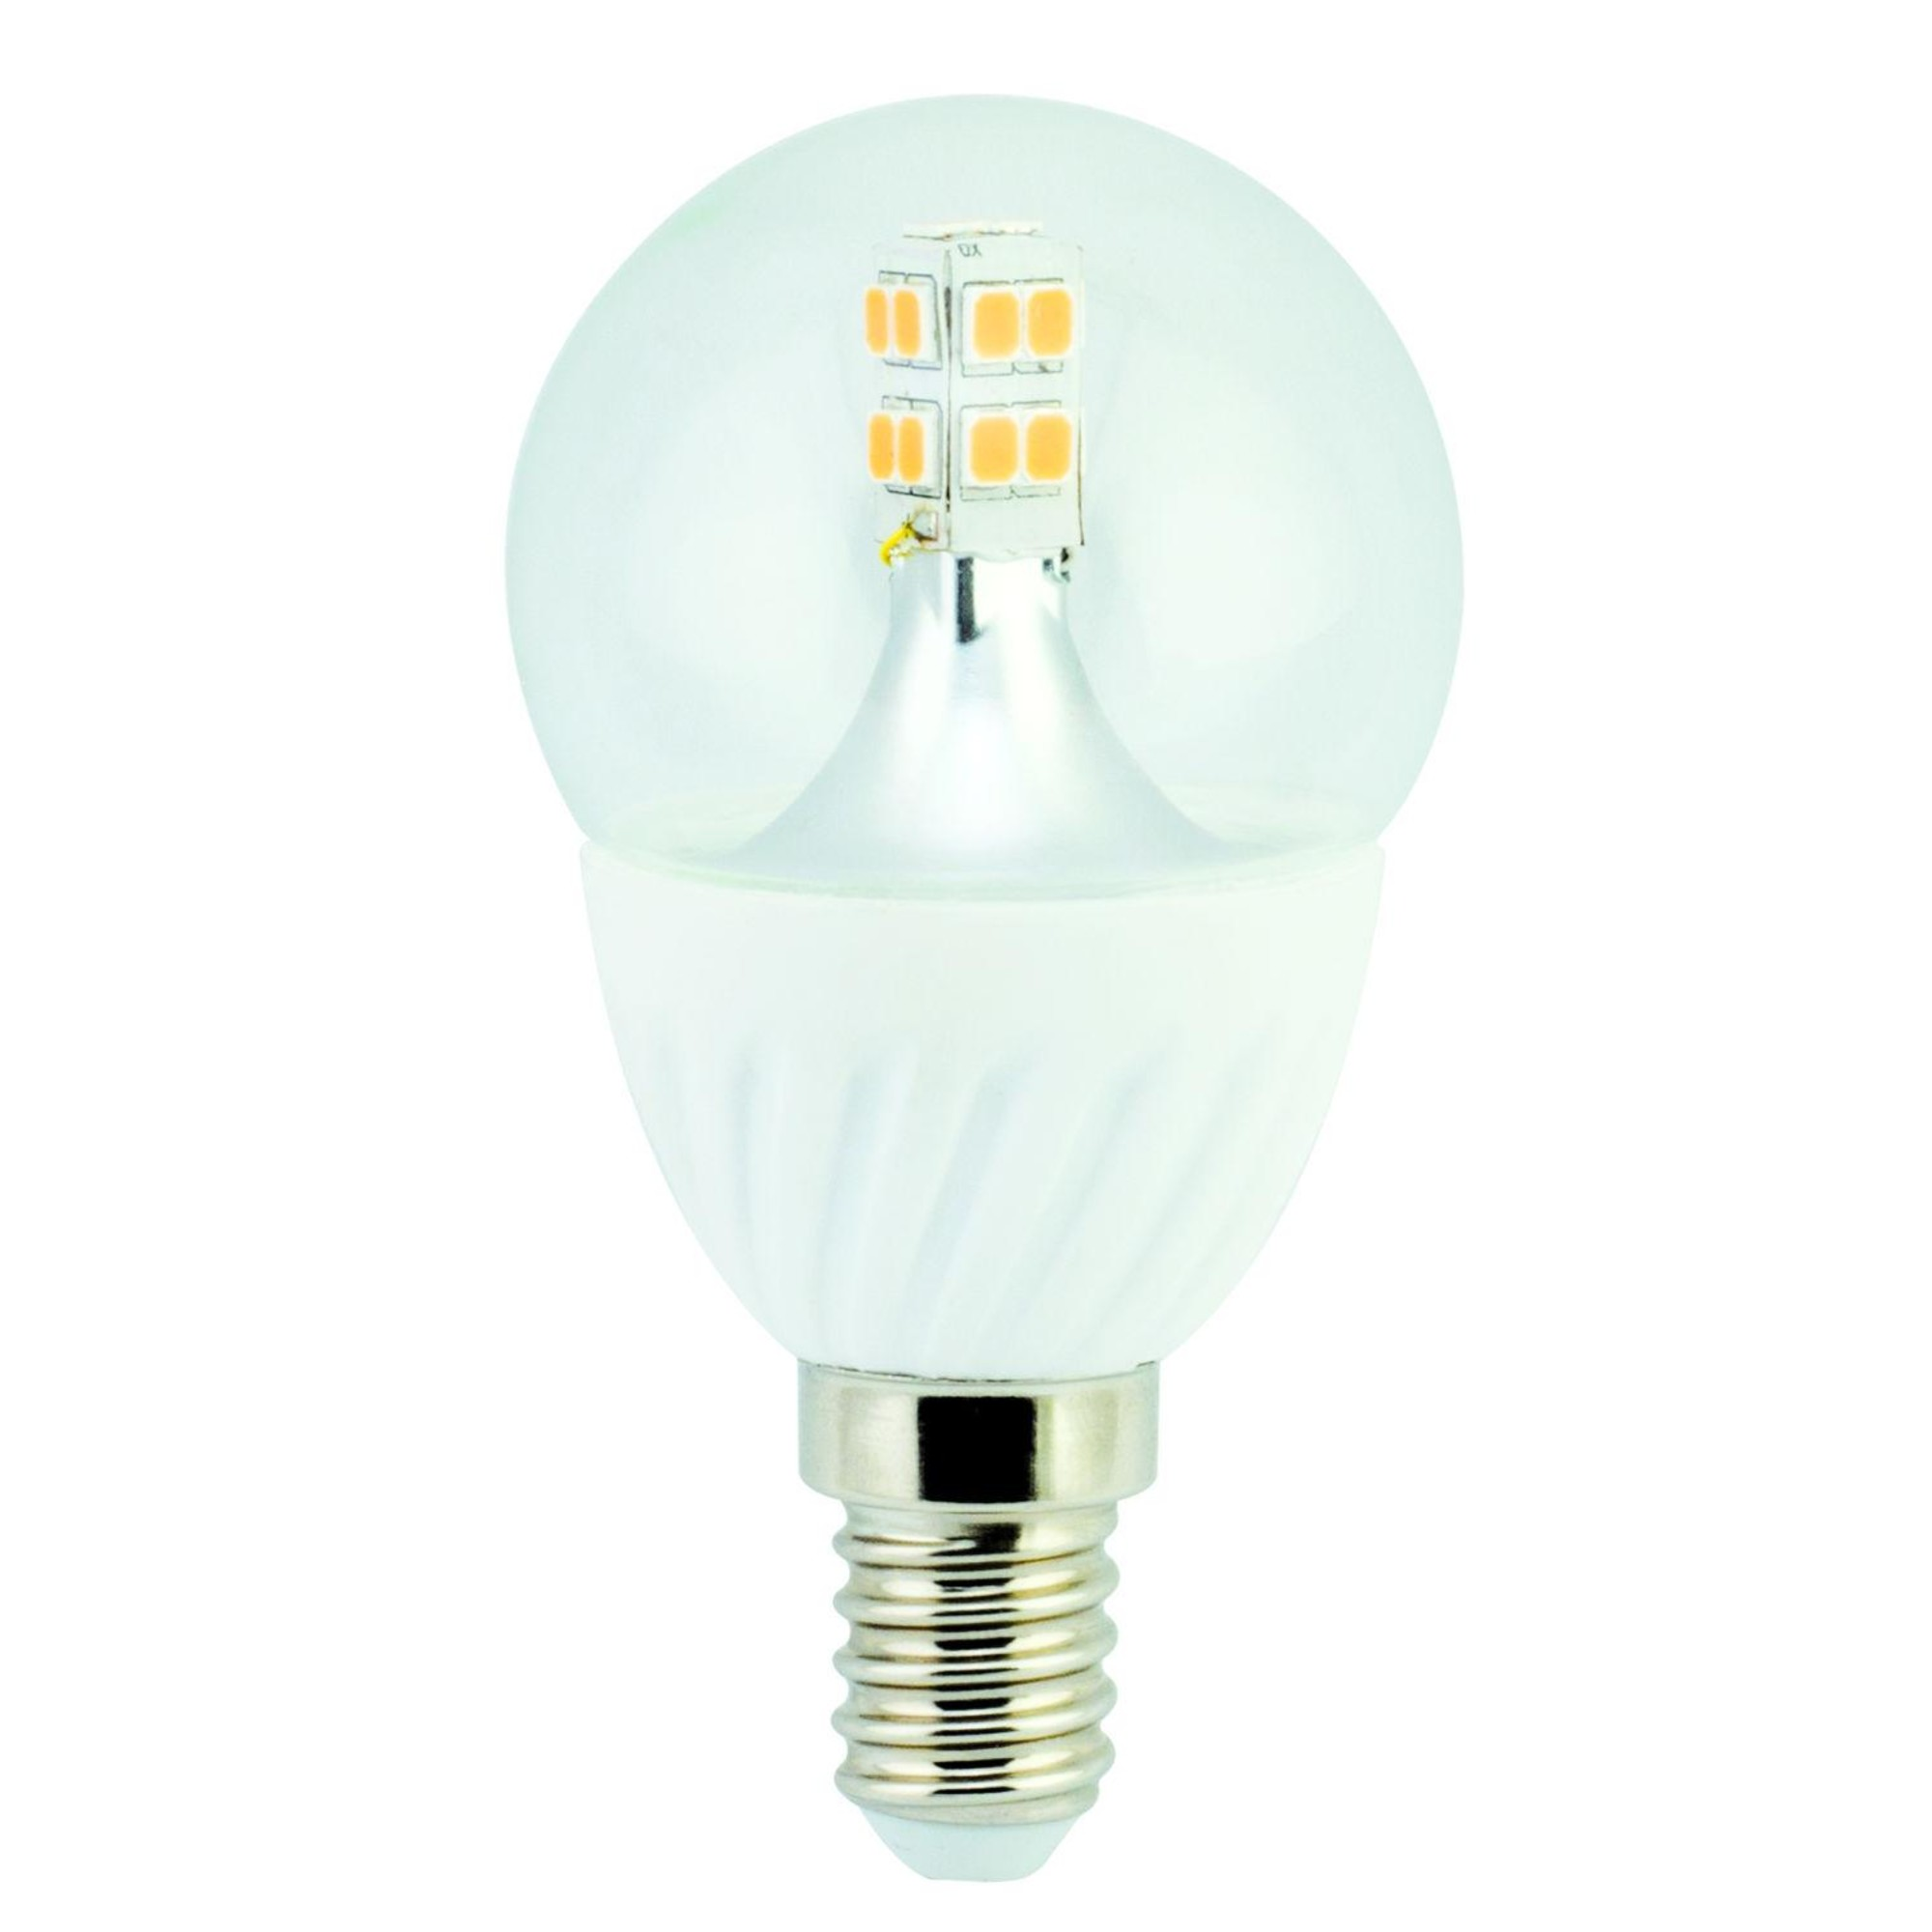 Лампа Ecola Premium светодионая E14 4 Вт шар 340 Лм теплый свет